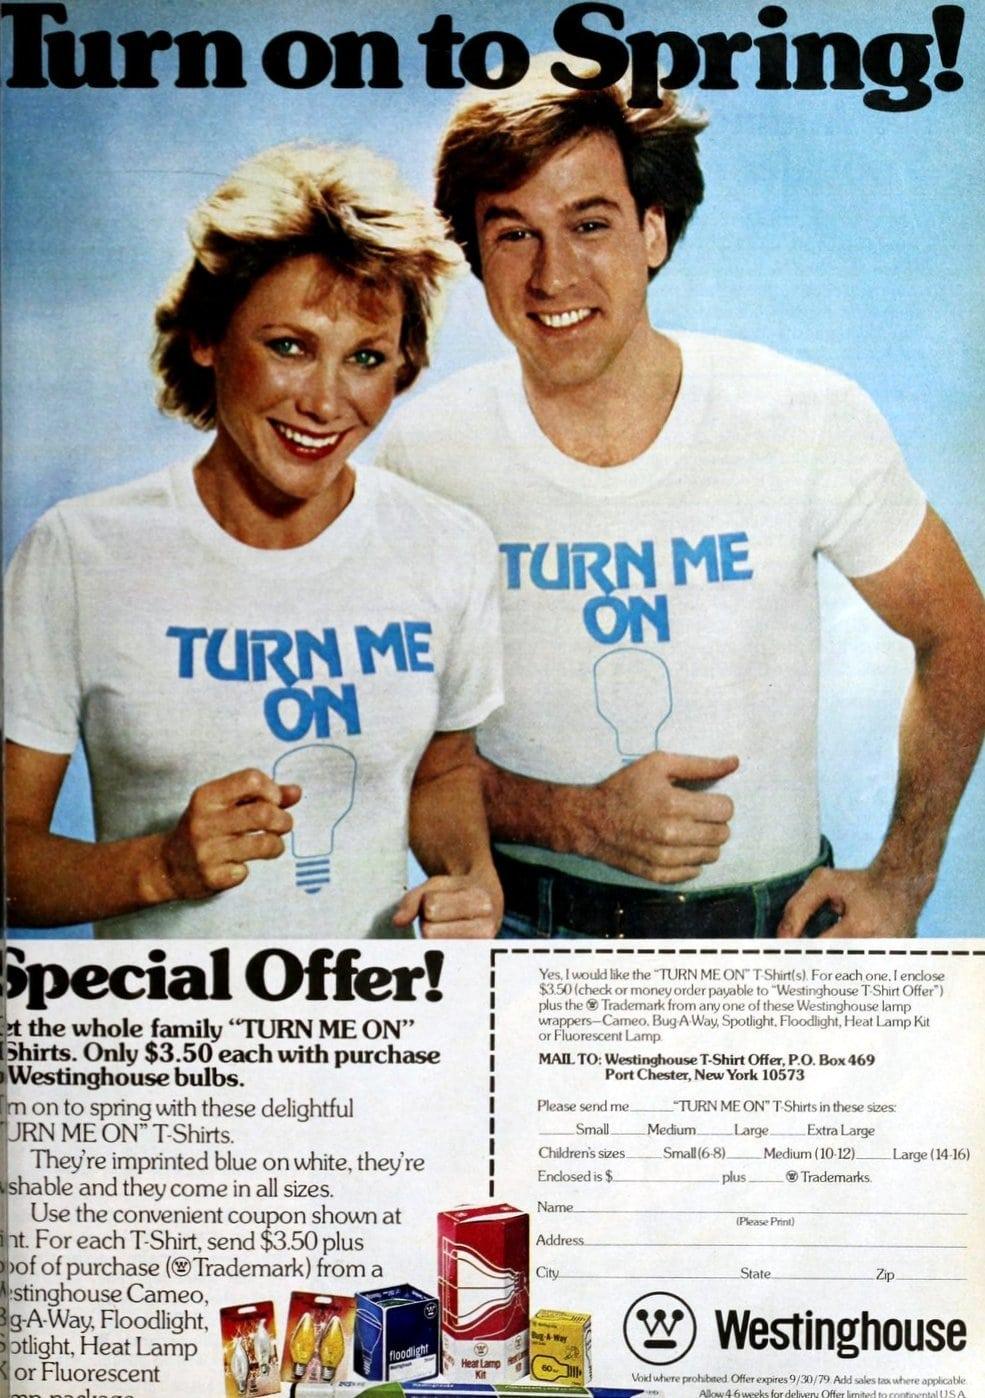 Turn me on - Lightbulb T-shirts from 1979